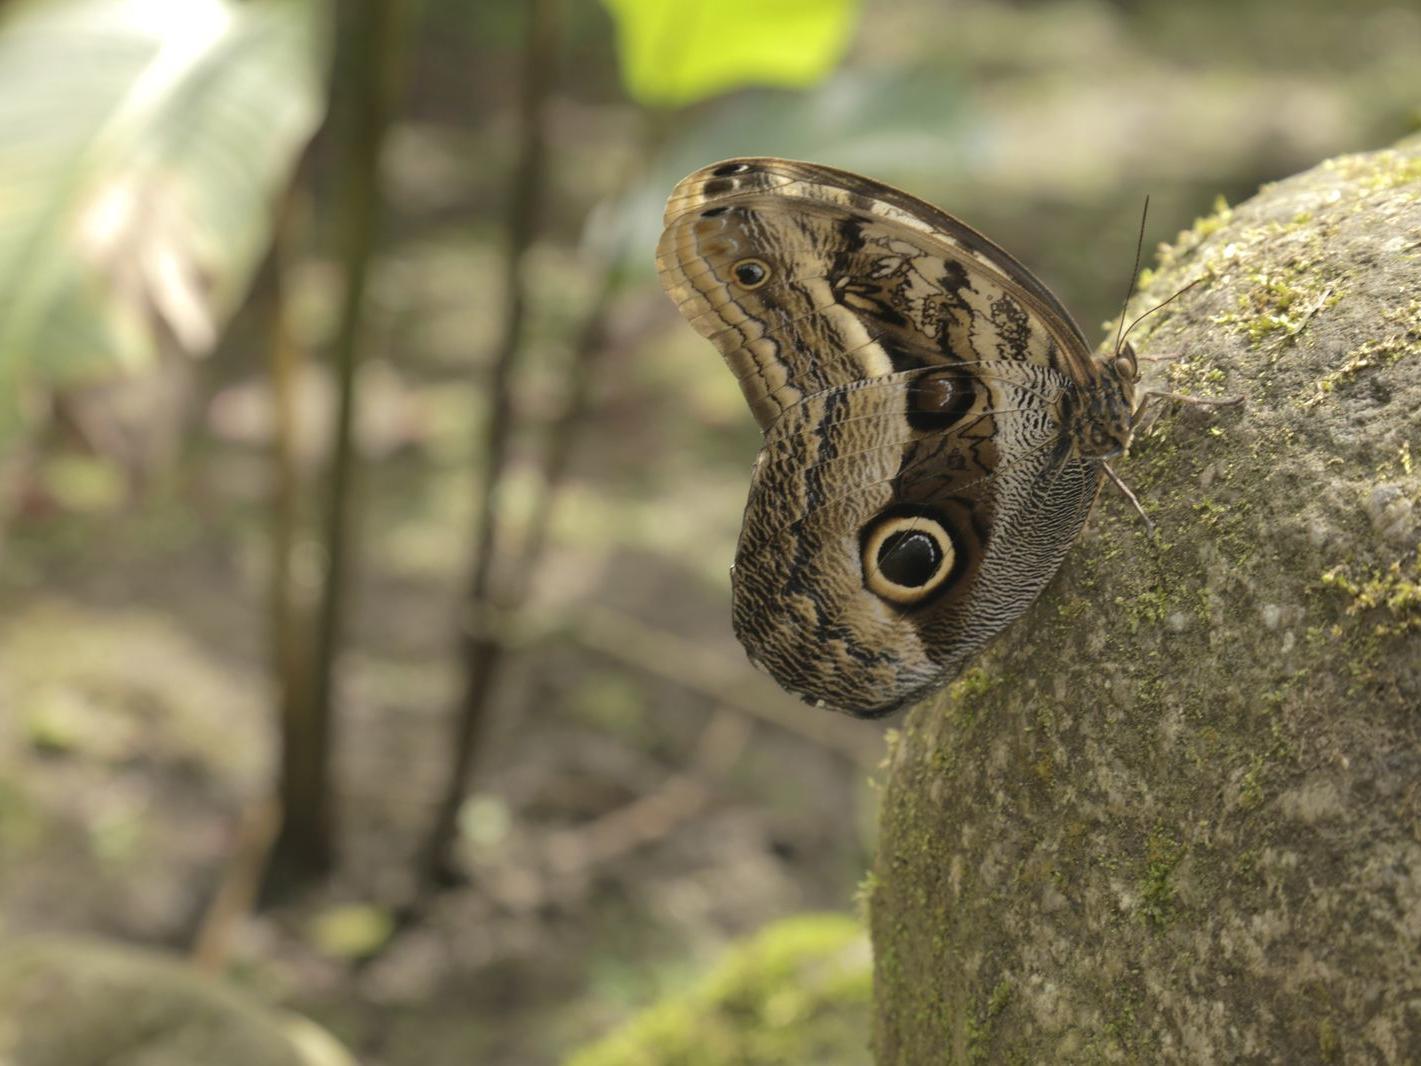 Capture of butterfly in Mariposarium  near Hotel Sumaq